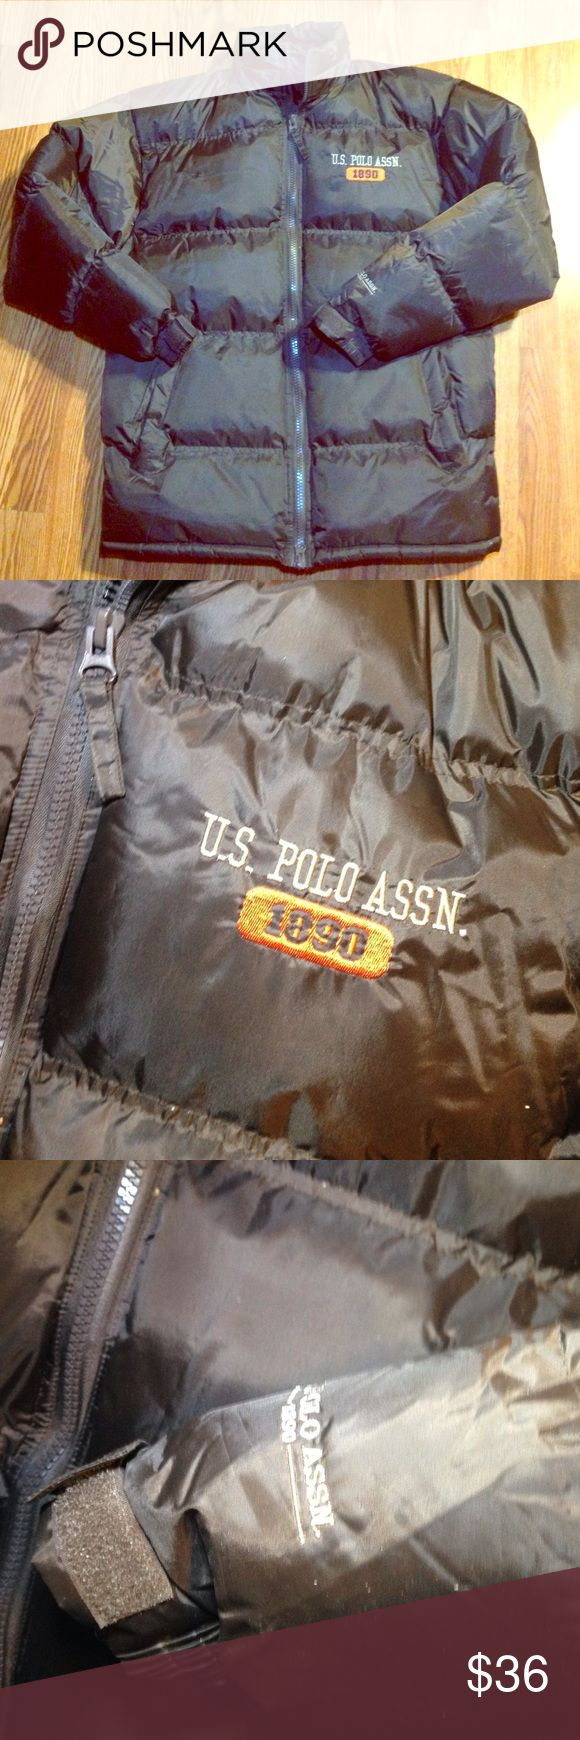 NWOT mens U.S. POLO puffer Coat size small brown NWOT mens U.S. POLO puffer Coat size small brown Nice feature inside coat no hood U.S. Polo Assn. Jackets & Coats Puffers